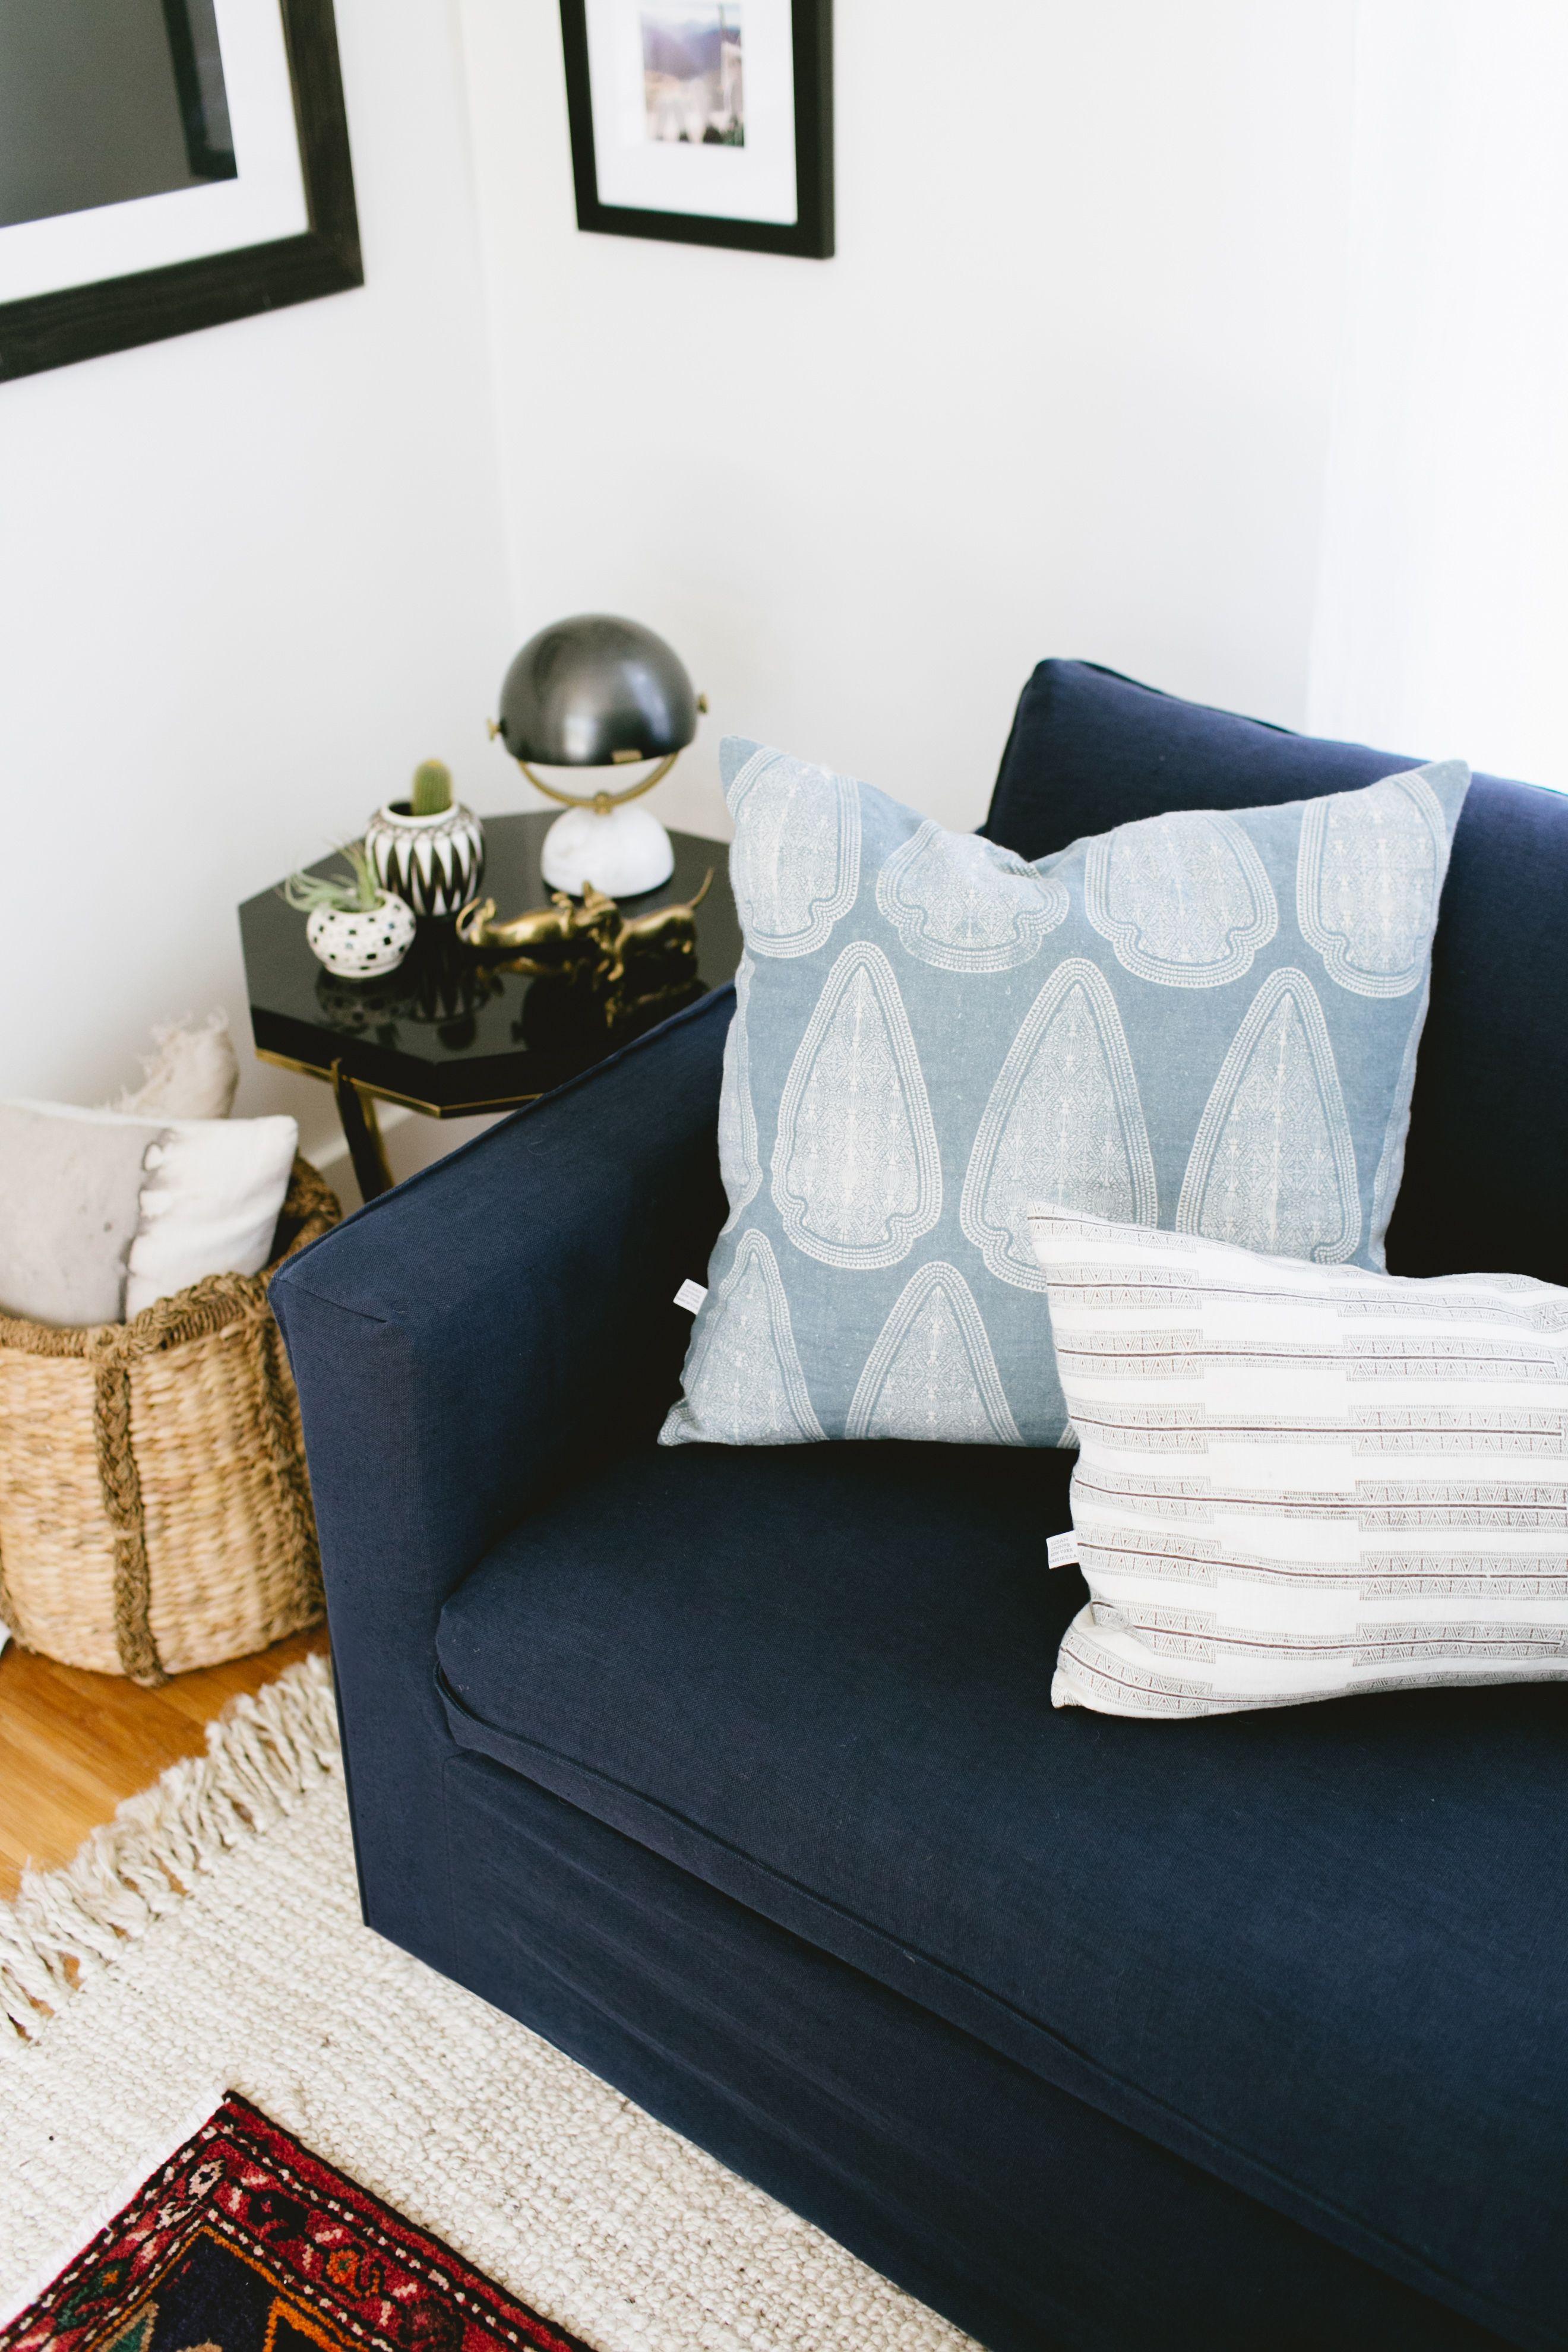 Jojotastic updated her tiny bungalow with an IKEA Karlstad sofa